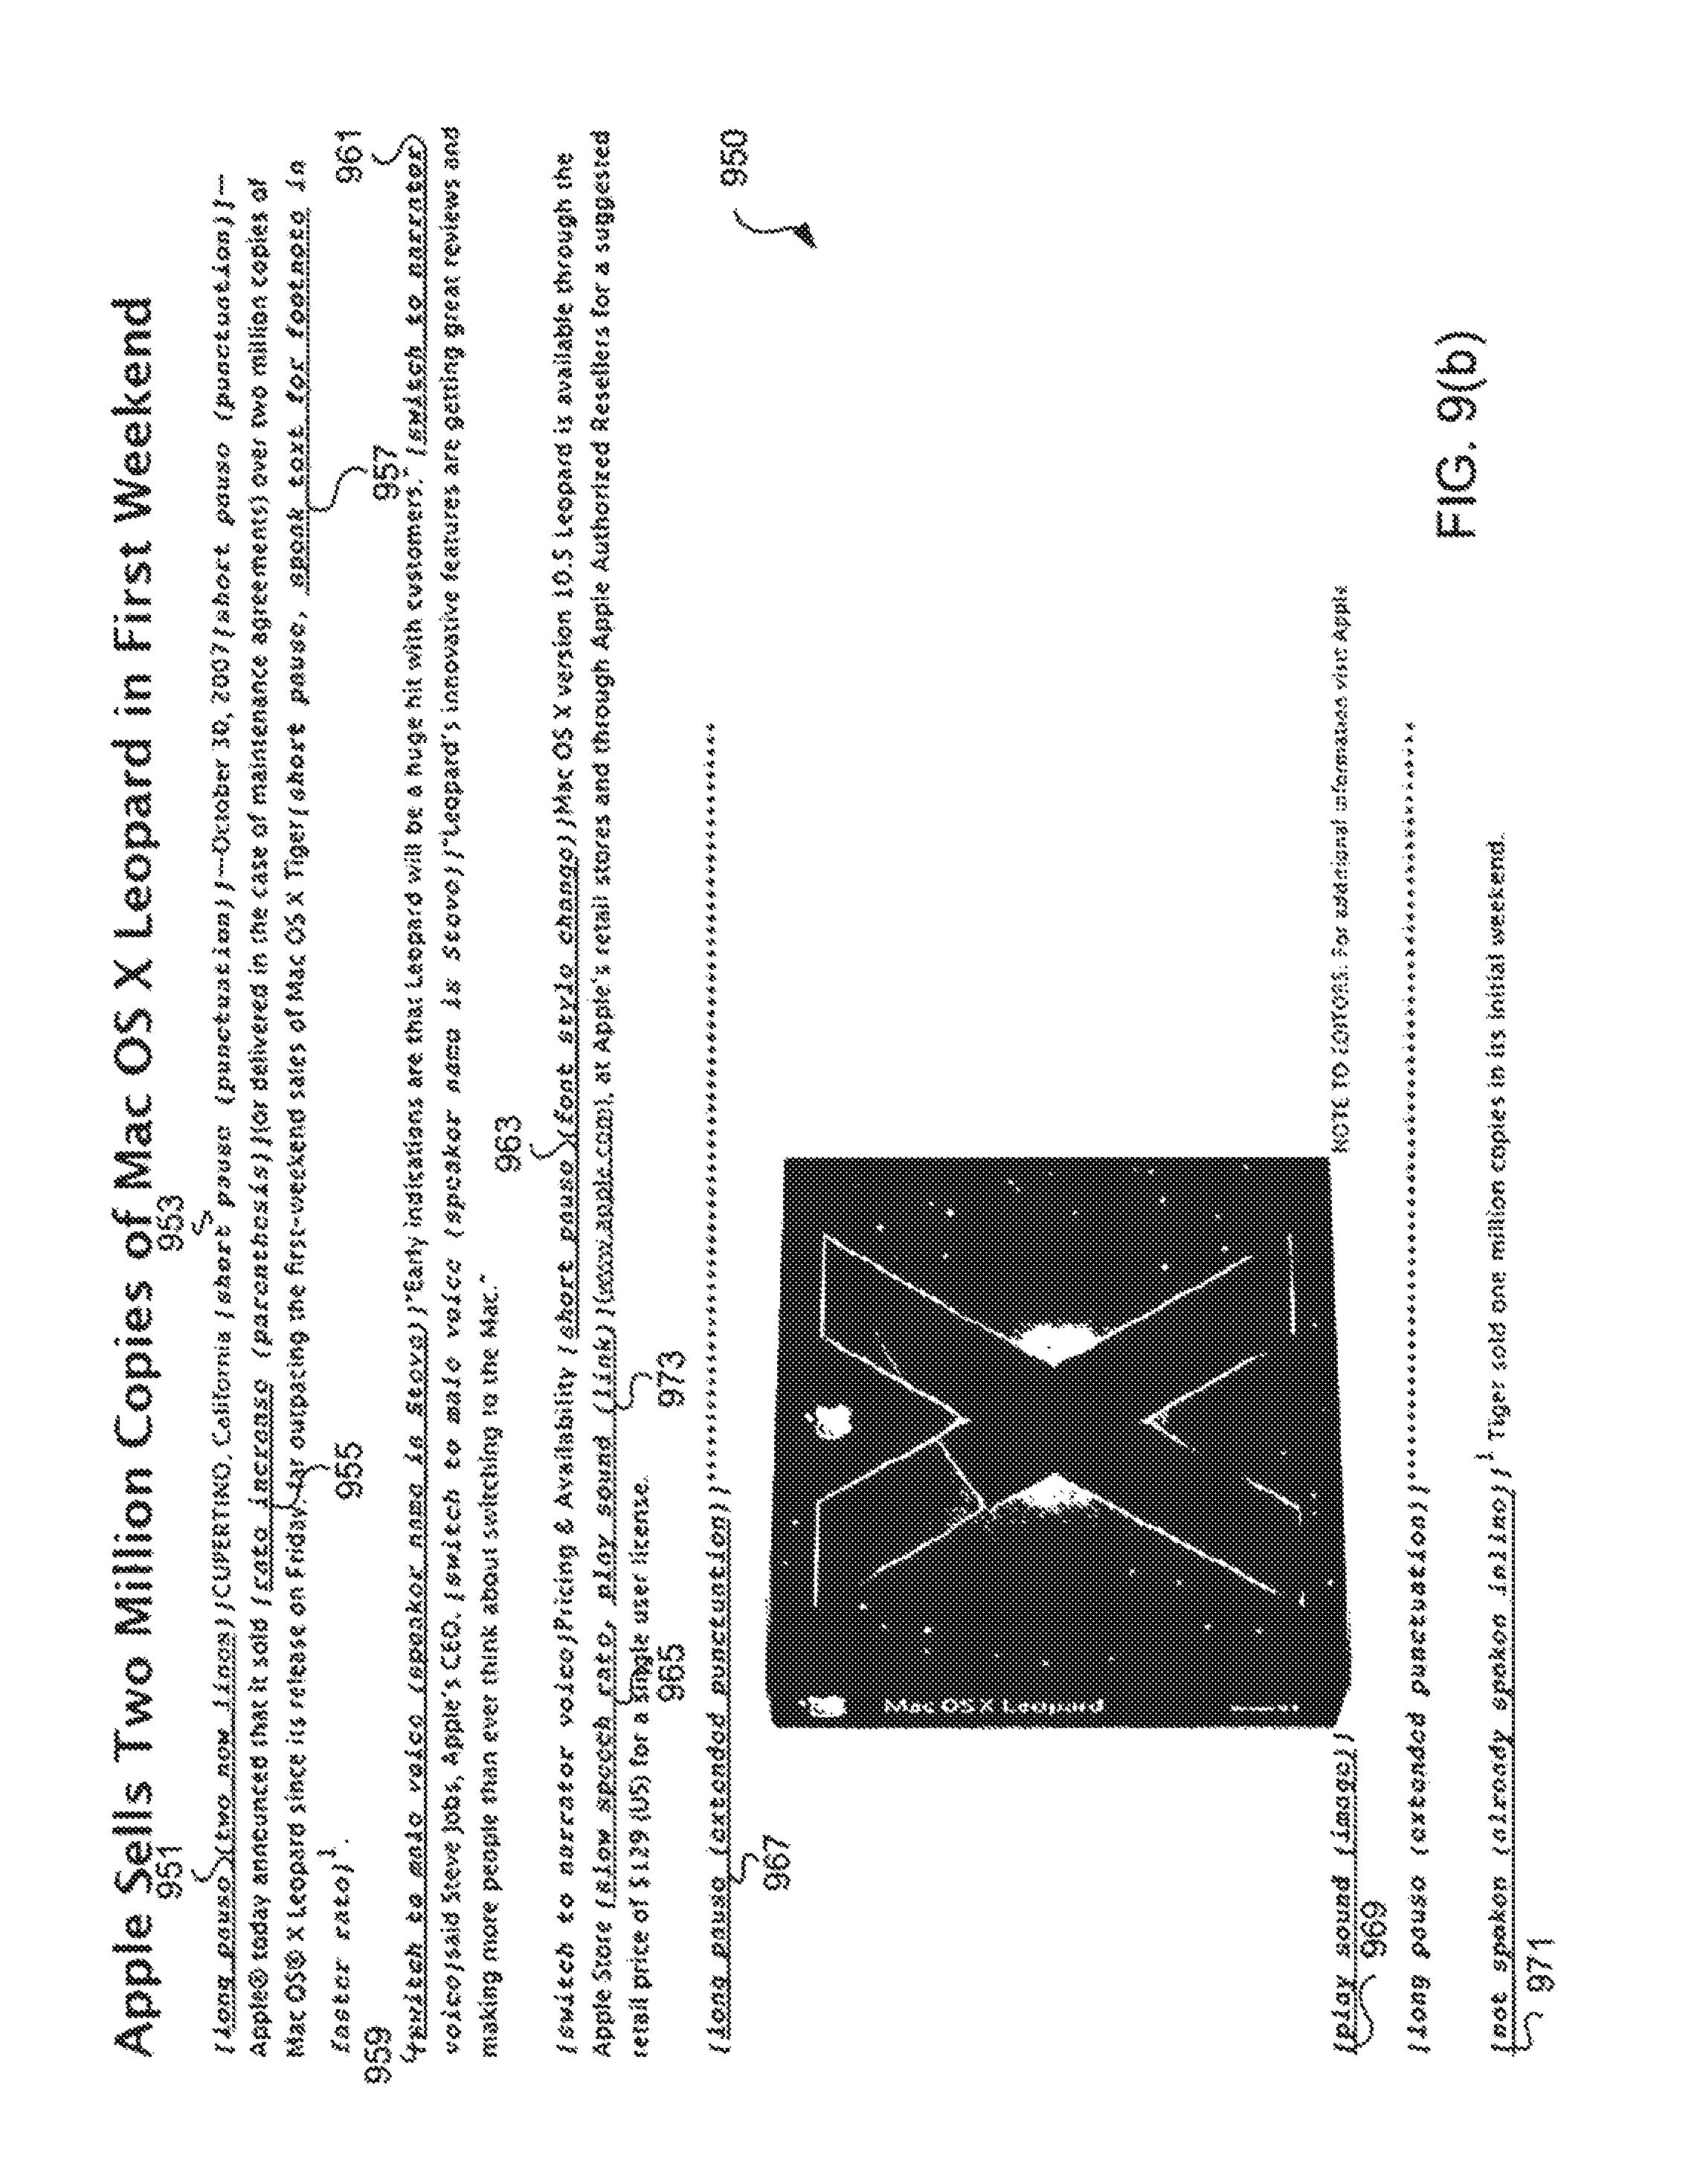 US9626955B2 - Intelligent text-to-speech conversion - Google Patents